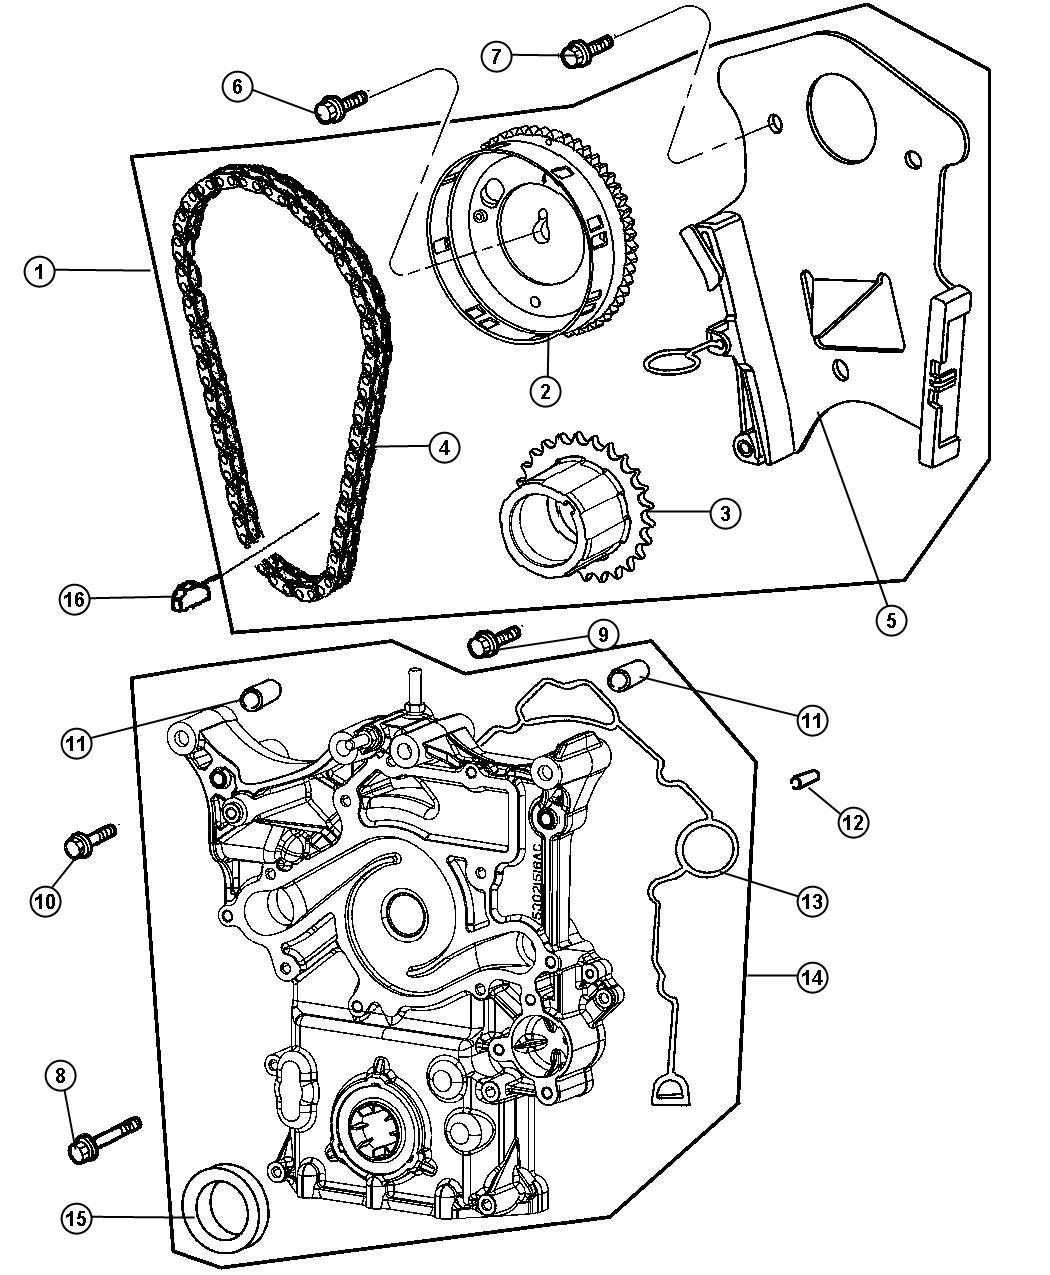 Dodge Durango Timing drive kit. Engine. Mega cab, quad cab